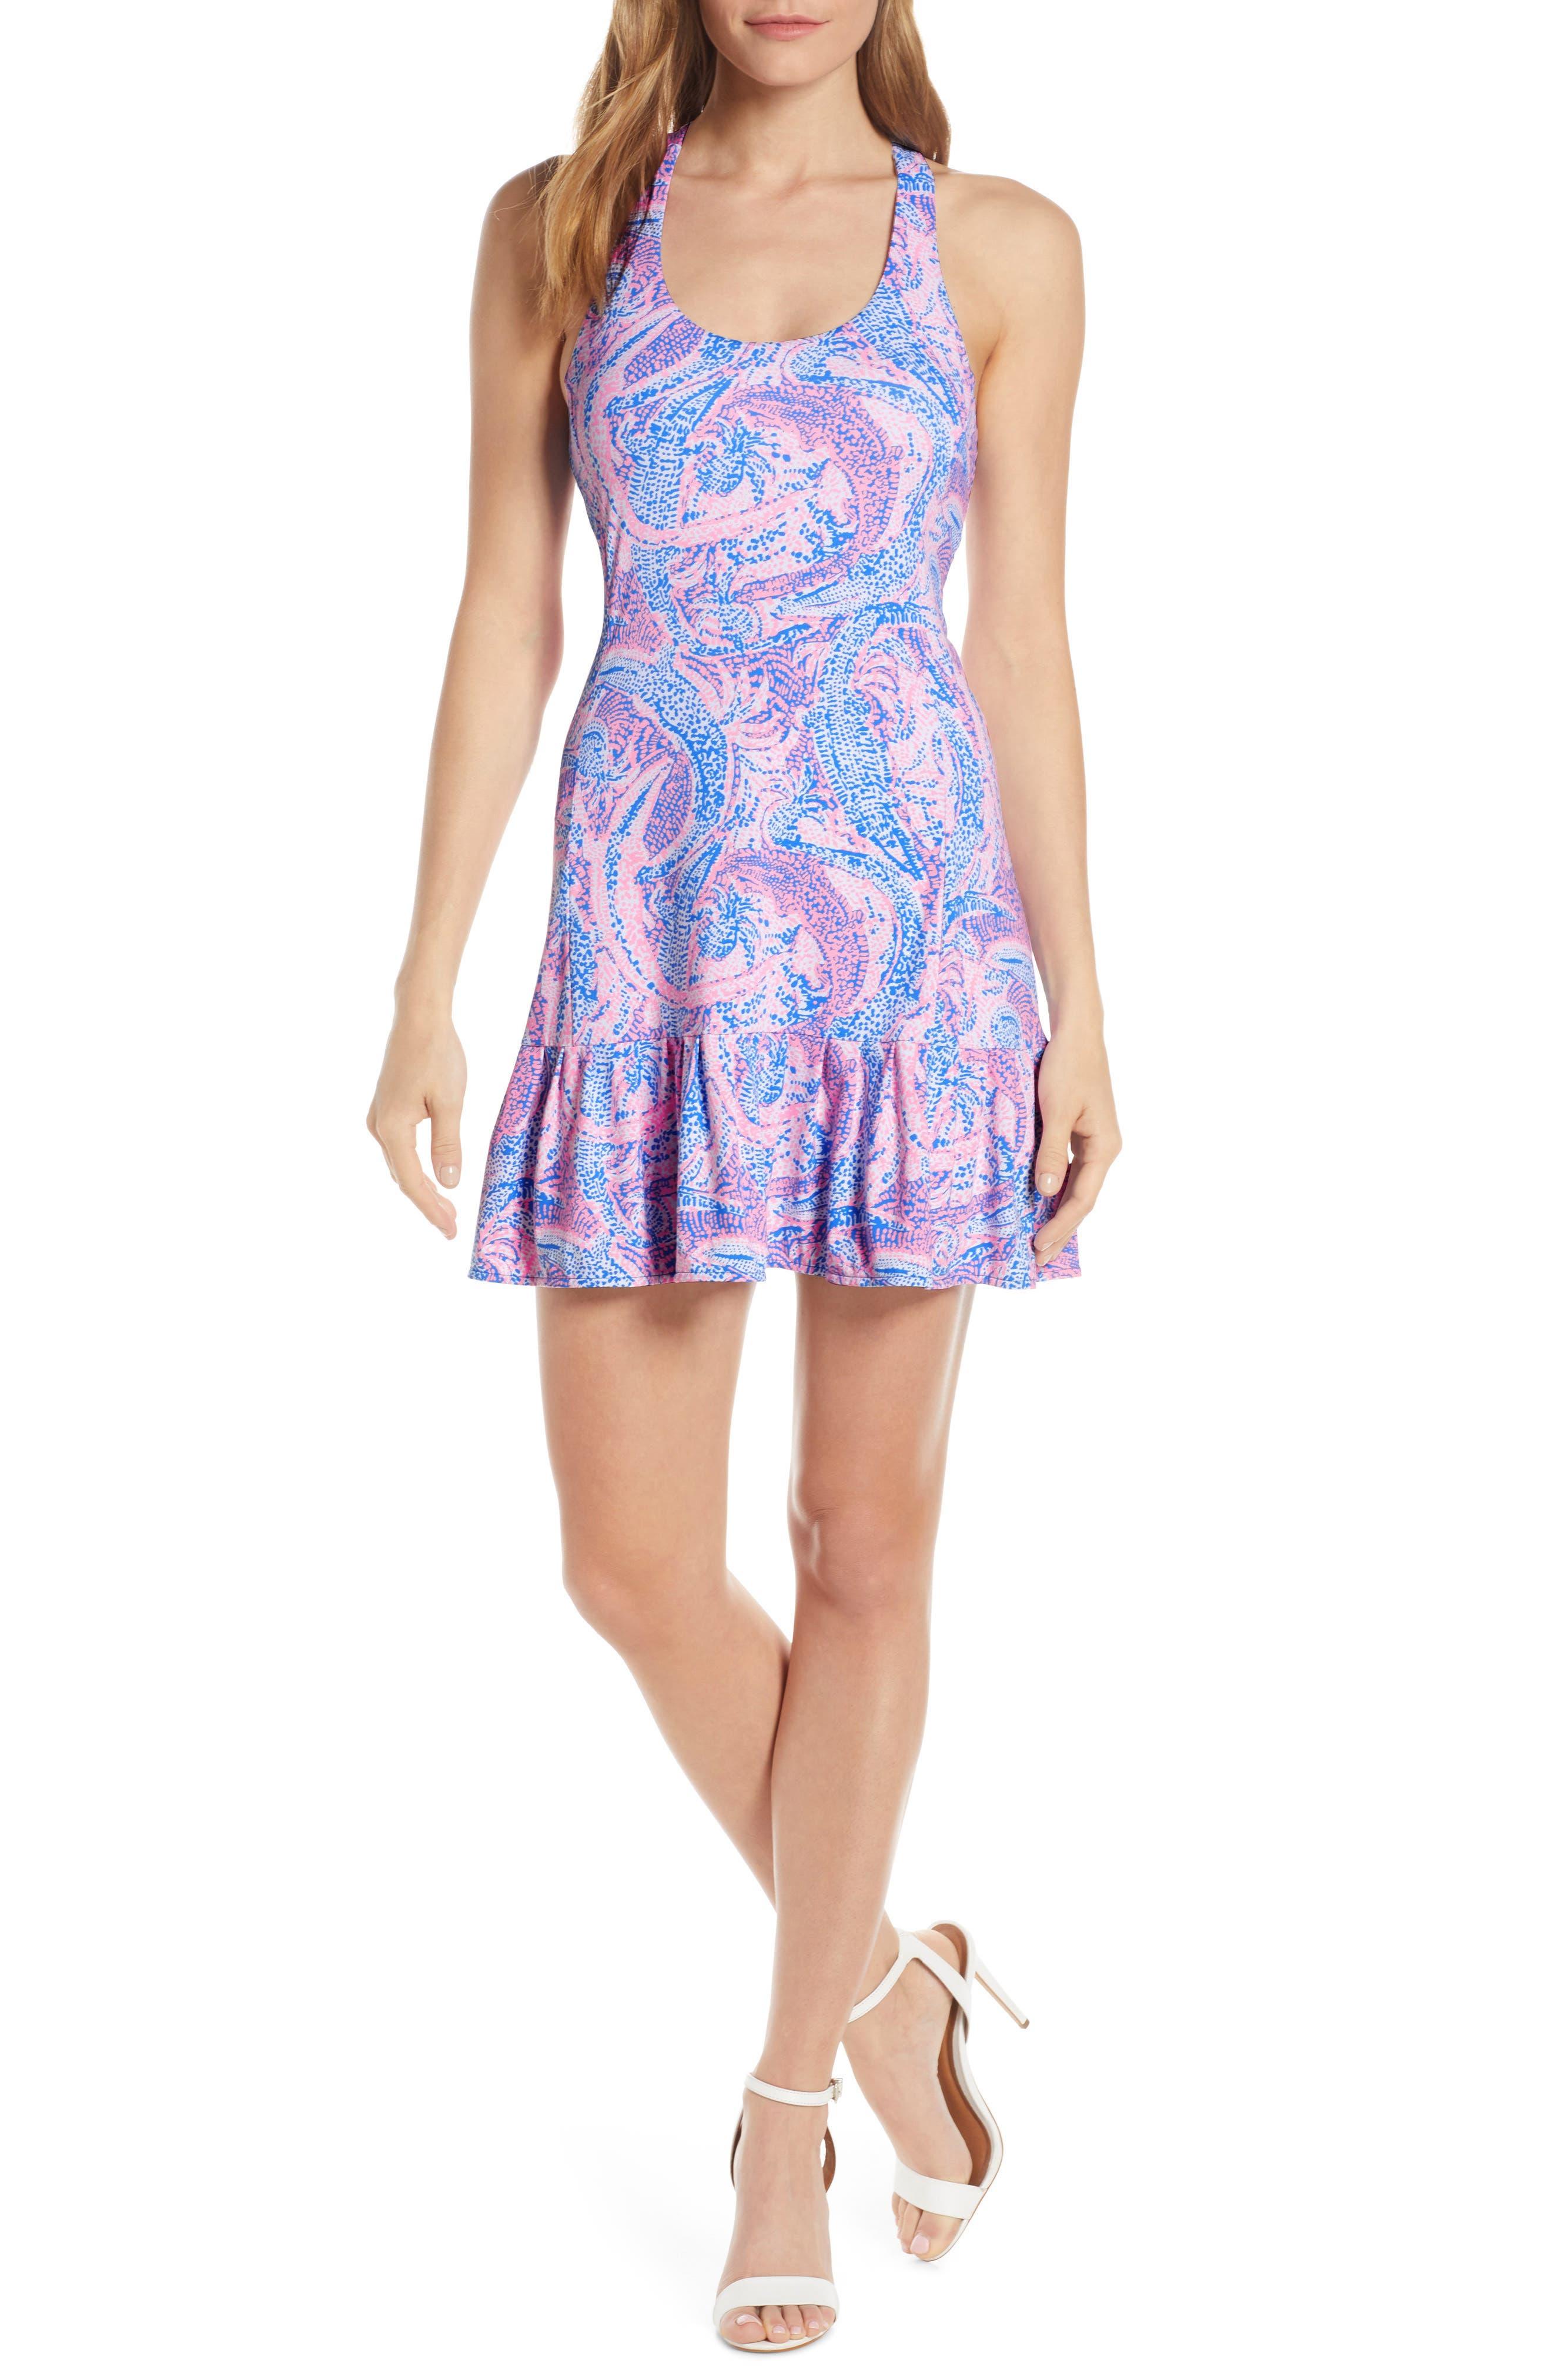 Lilly Pulitzer Meryl Upf 50+ Ace Tennis Dress & Shorts Set, Blue